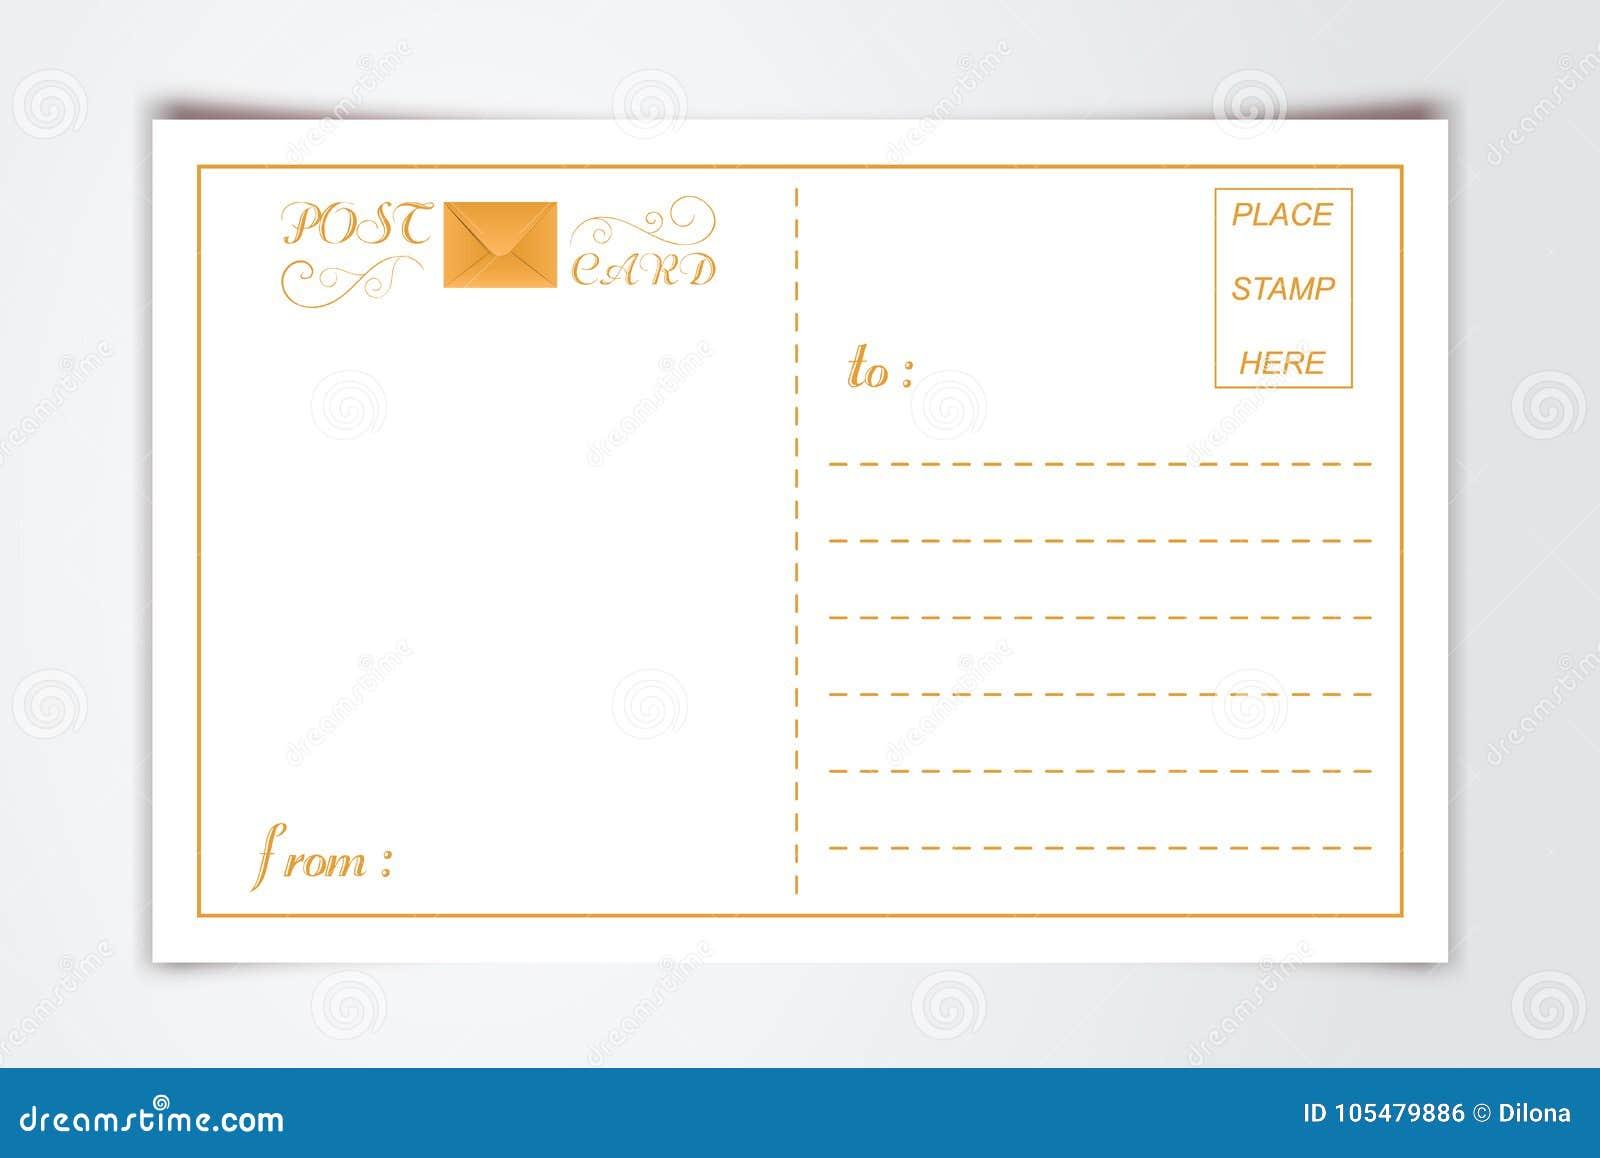 Modern Postcard Inner Reverse Side Blank Template With Logo ...